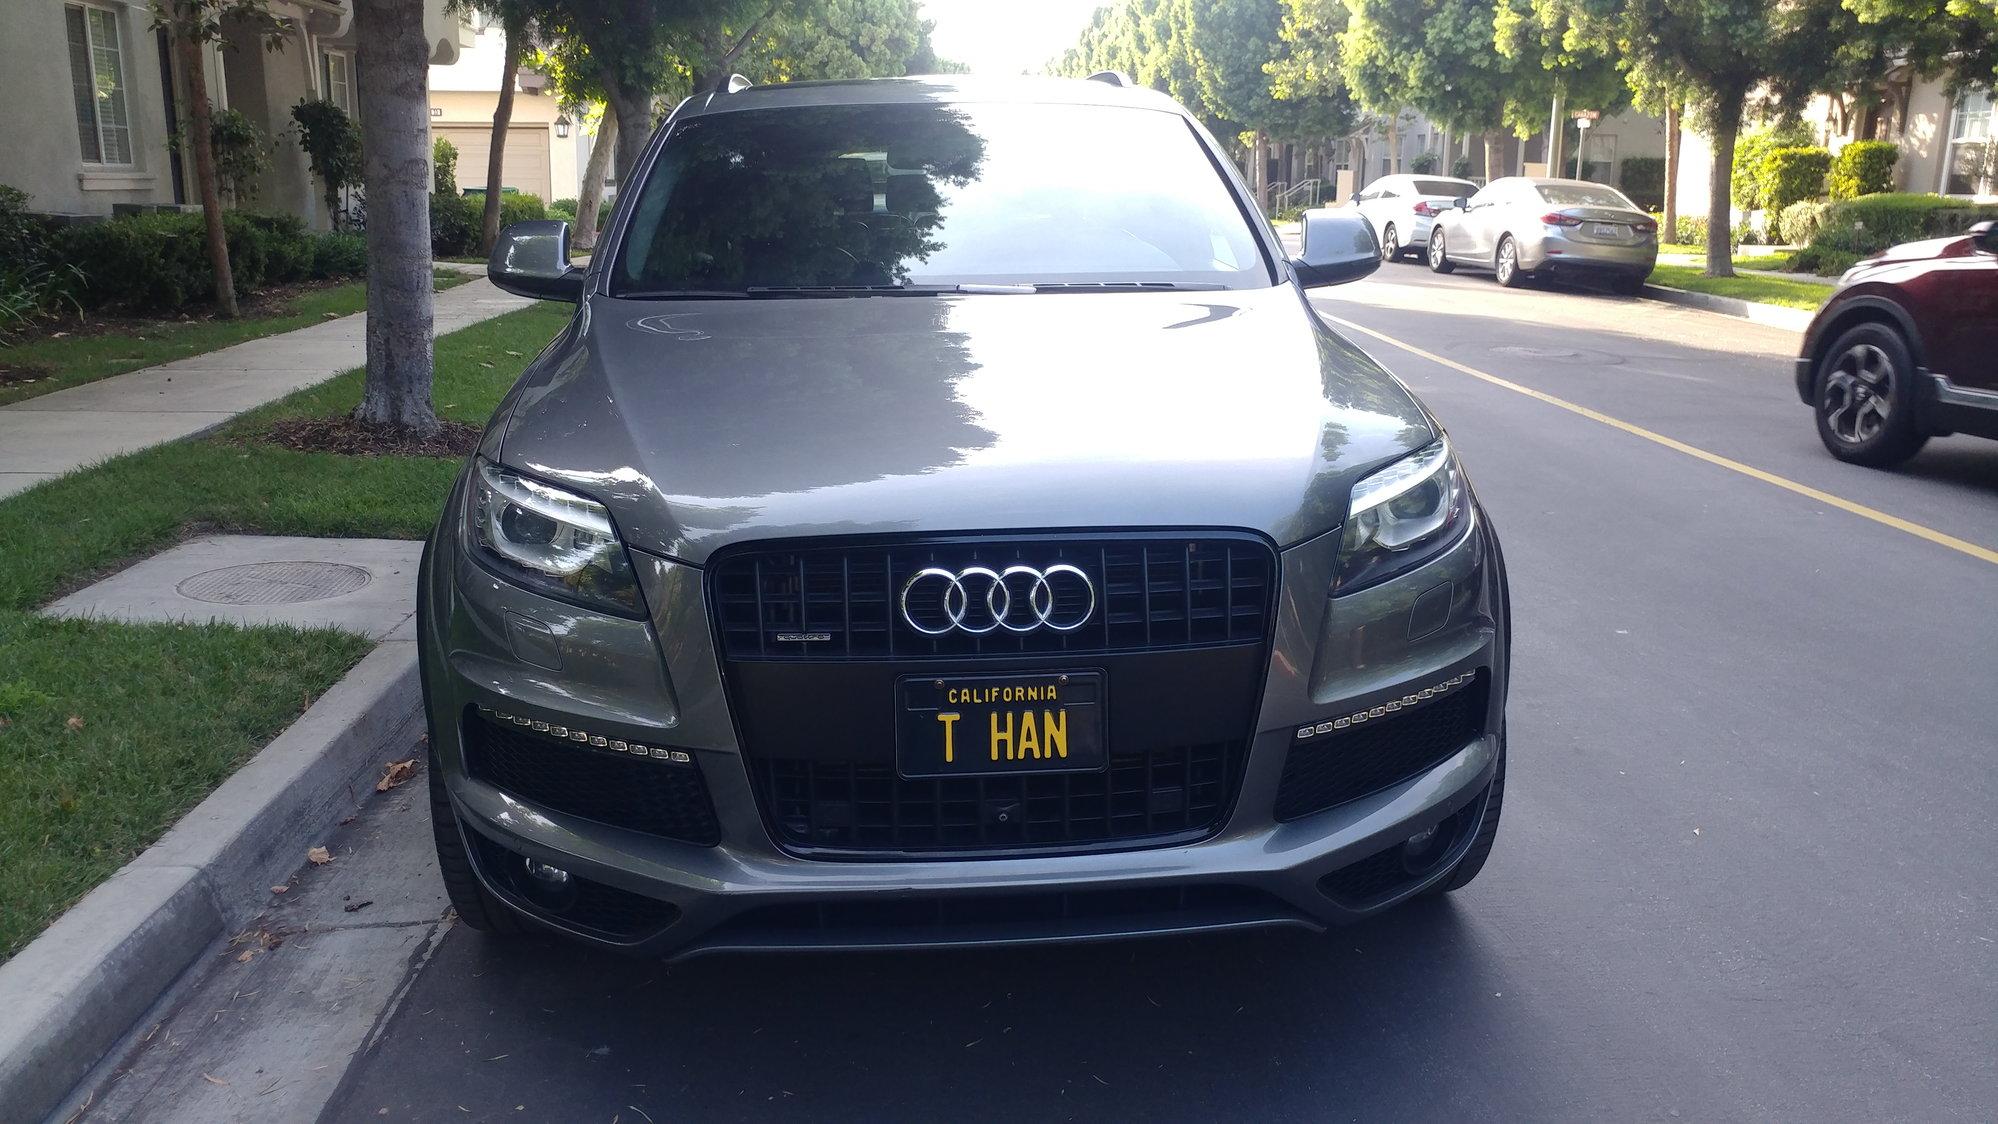 Audi Q7 FS in CA SoCal Audi Q7 2014 S-Line Prestige - AudiWorld Forums